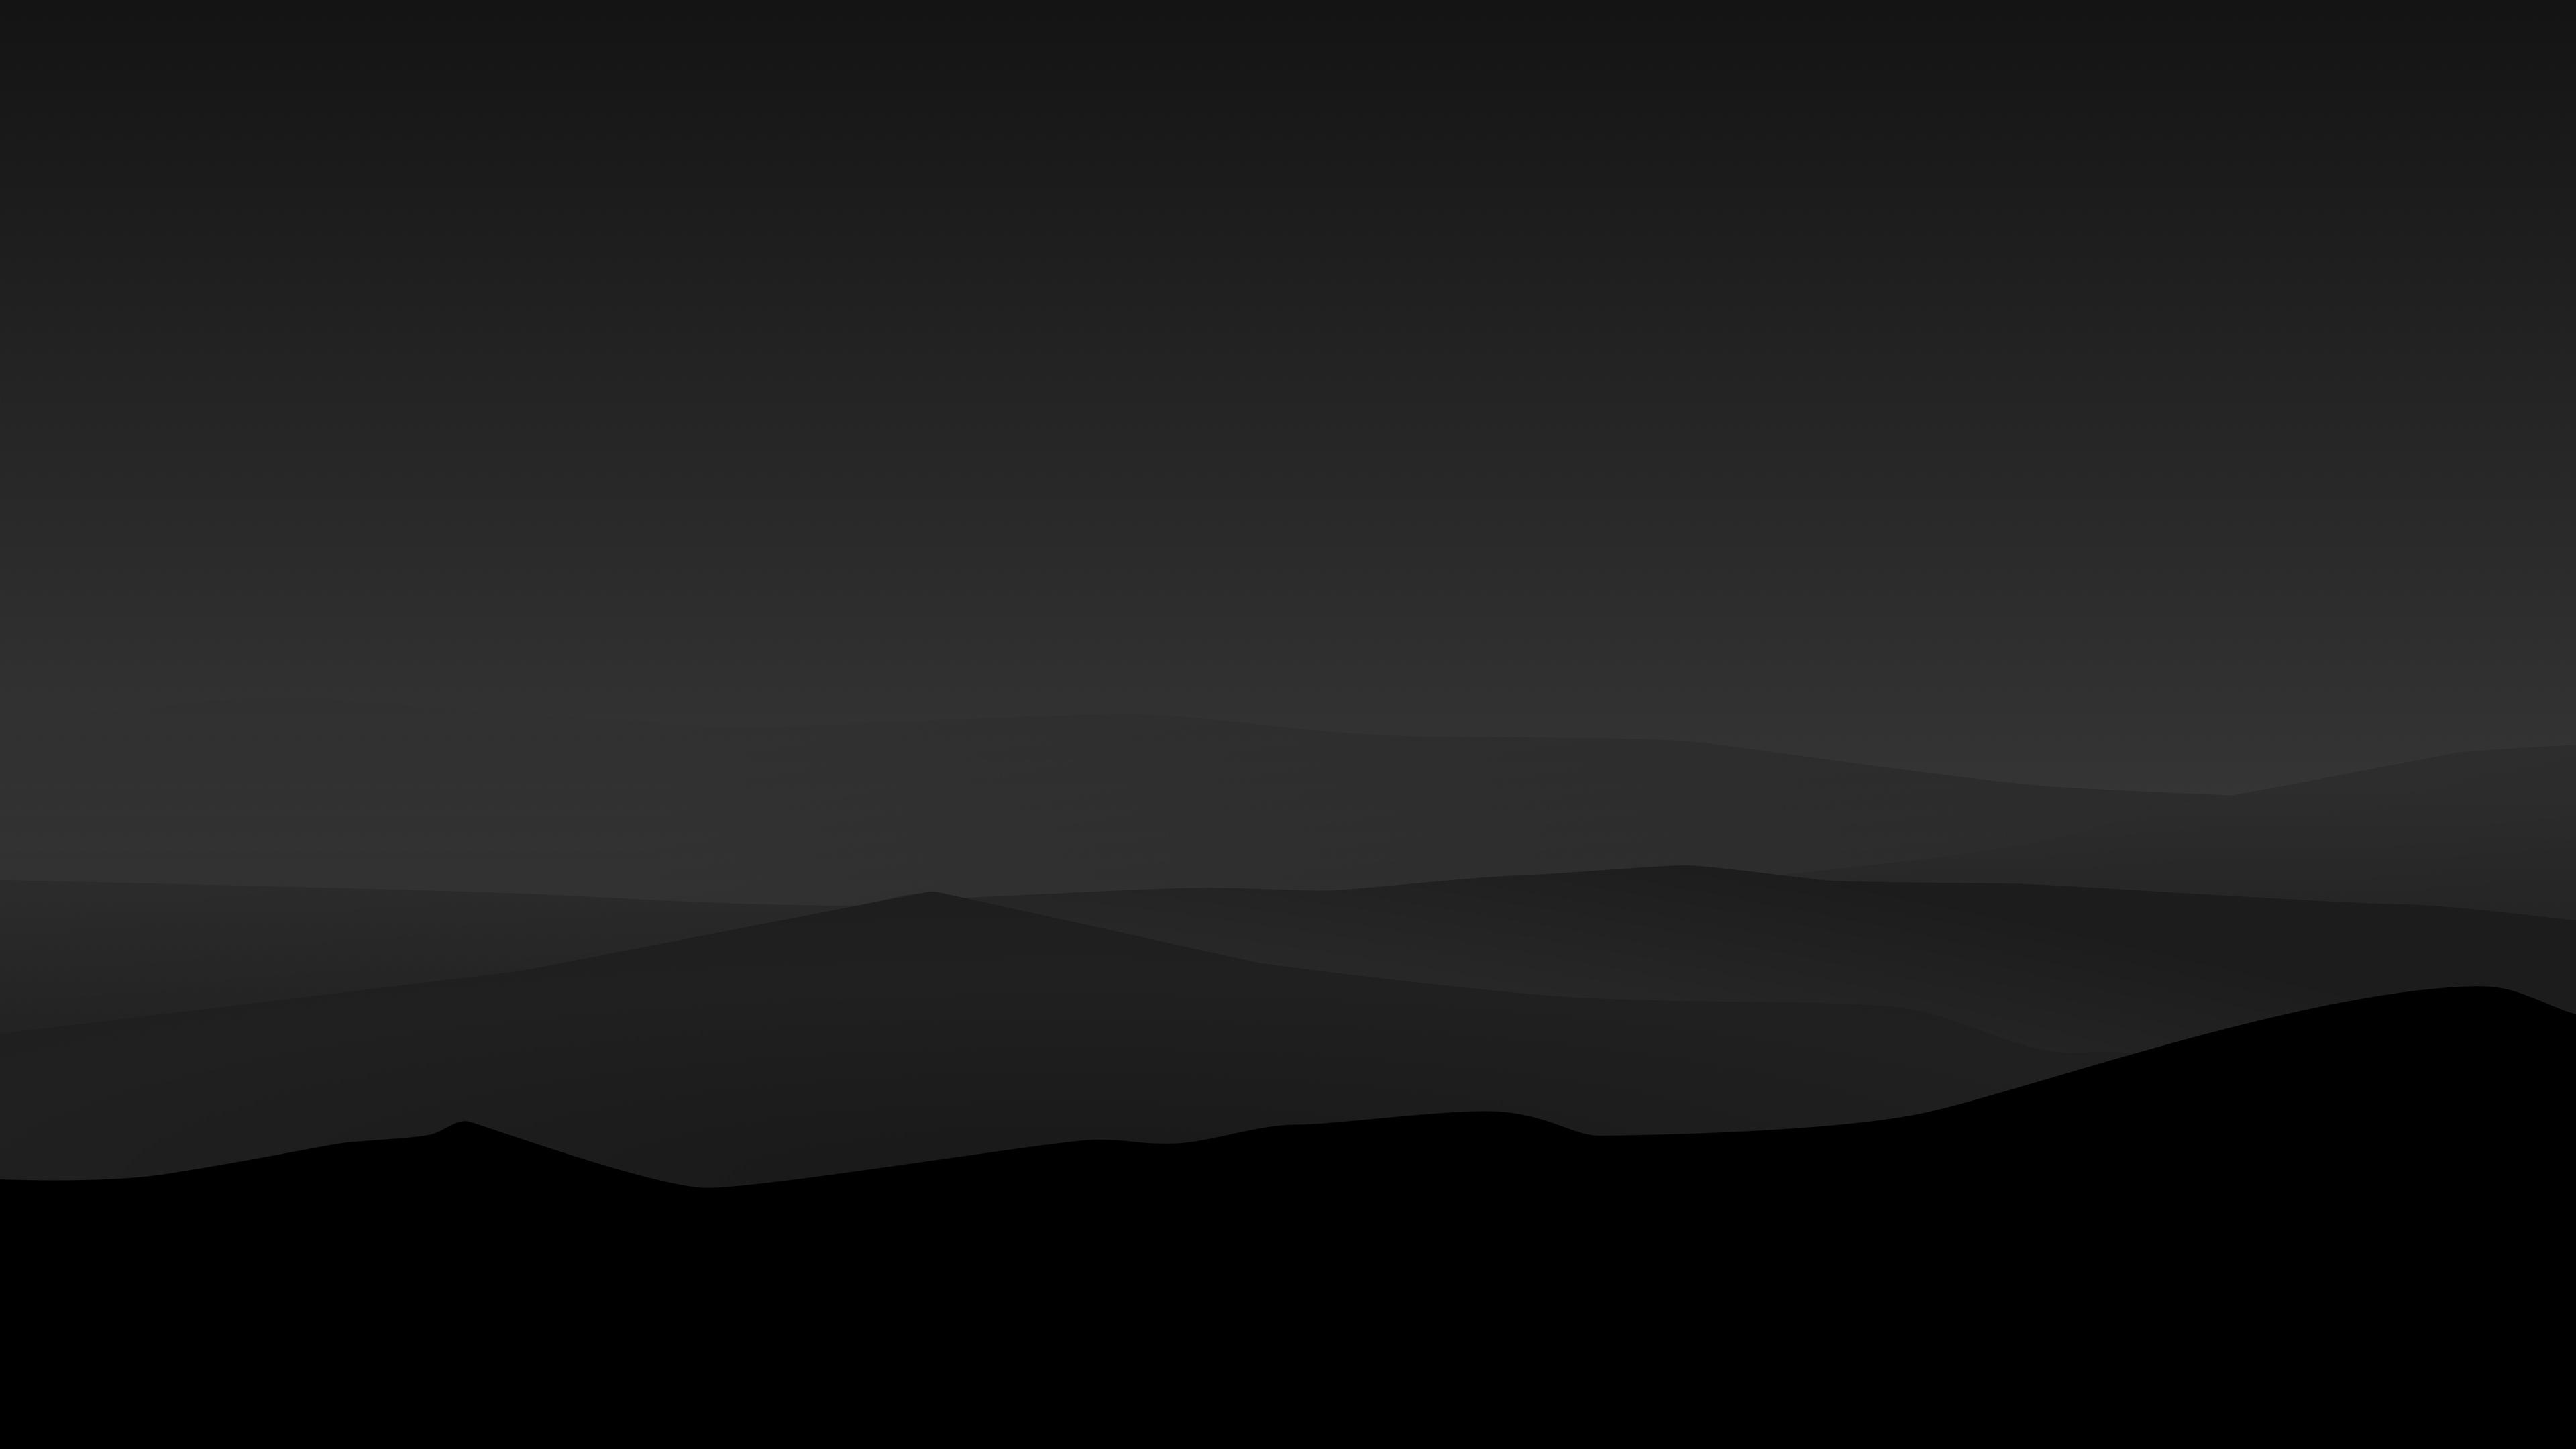 Wallpaper 4k Dark Night Mountains Minimalist 4k 4k